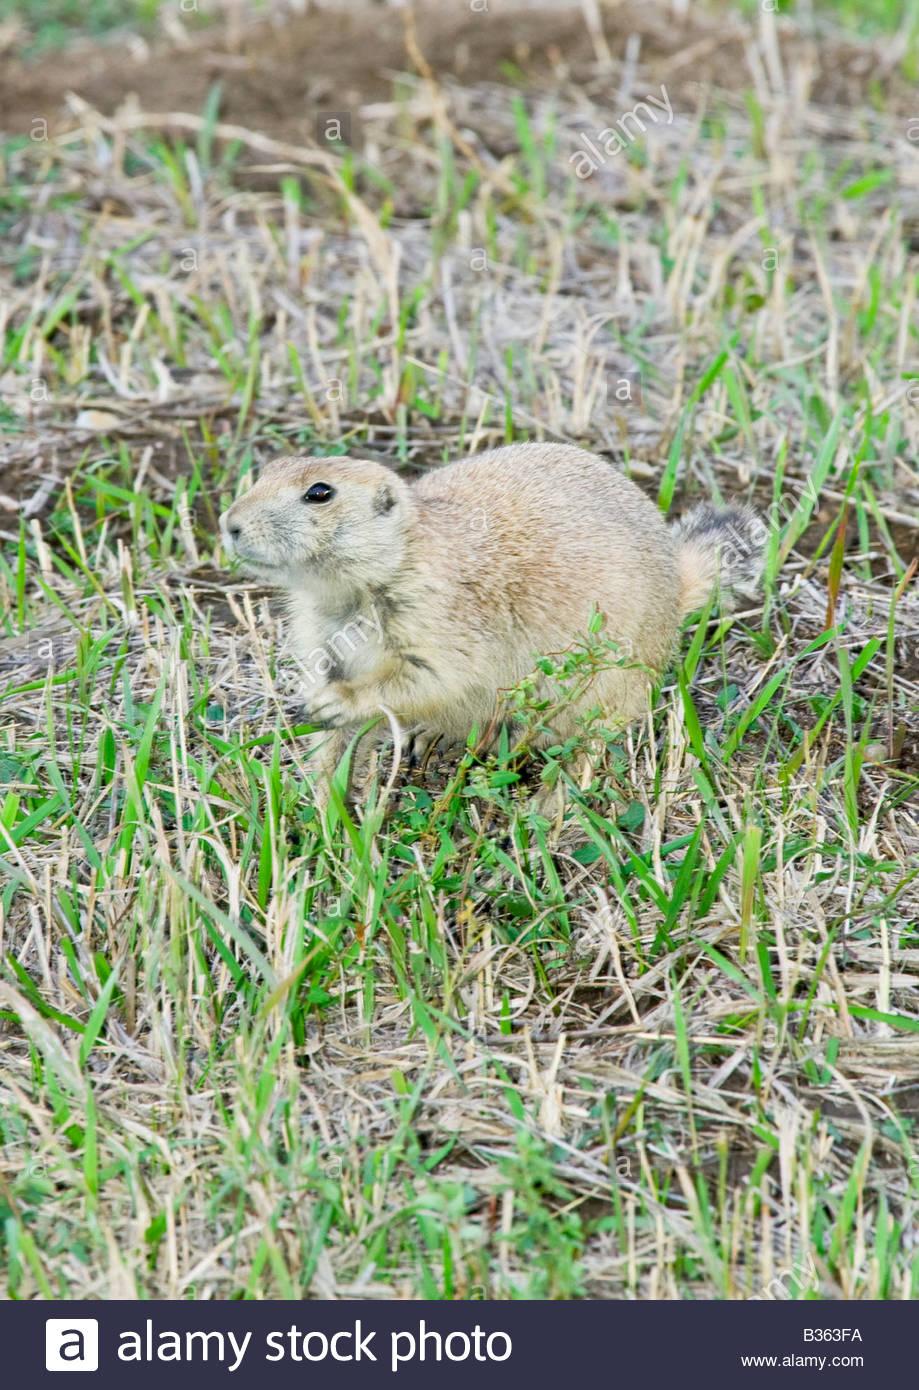 Badlands National Park prairie dog having a snack - Stock Image